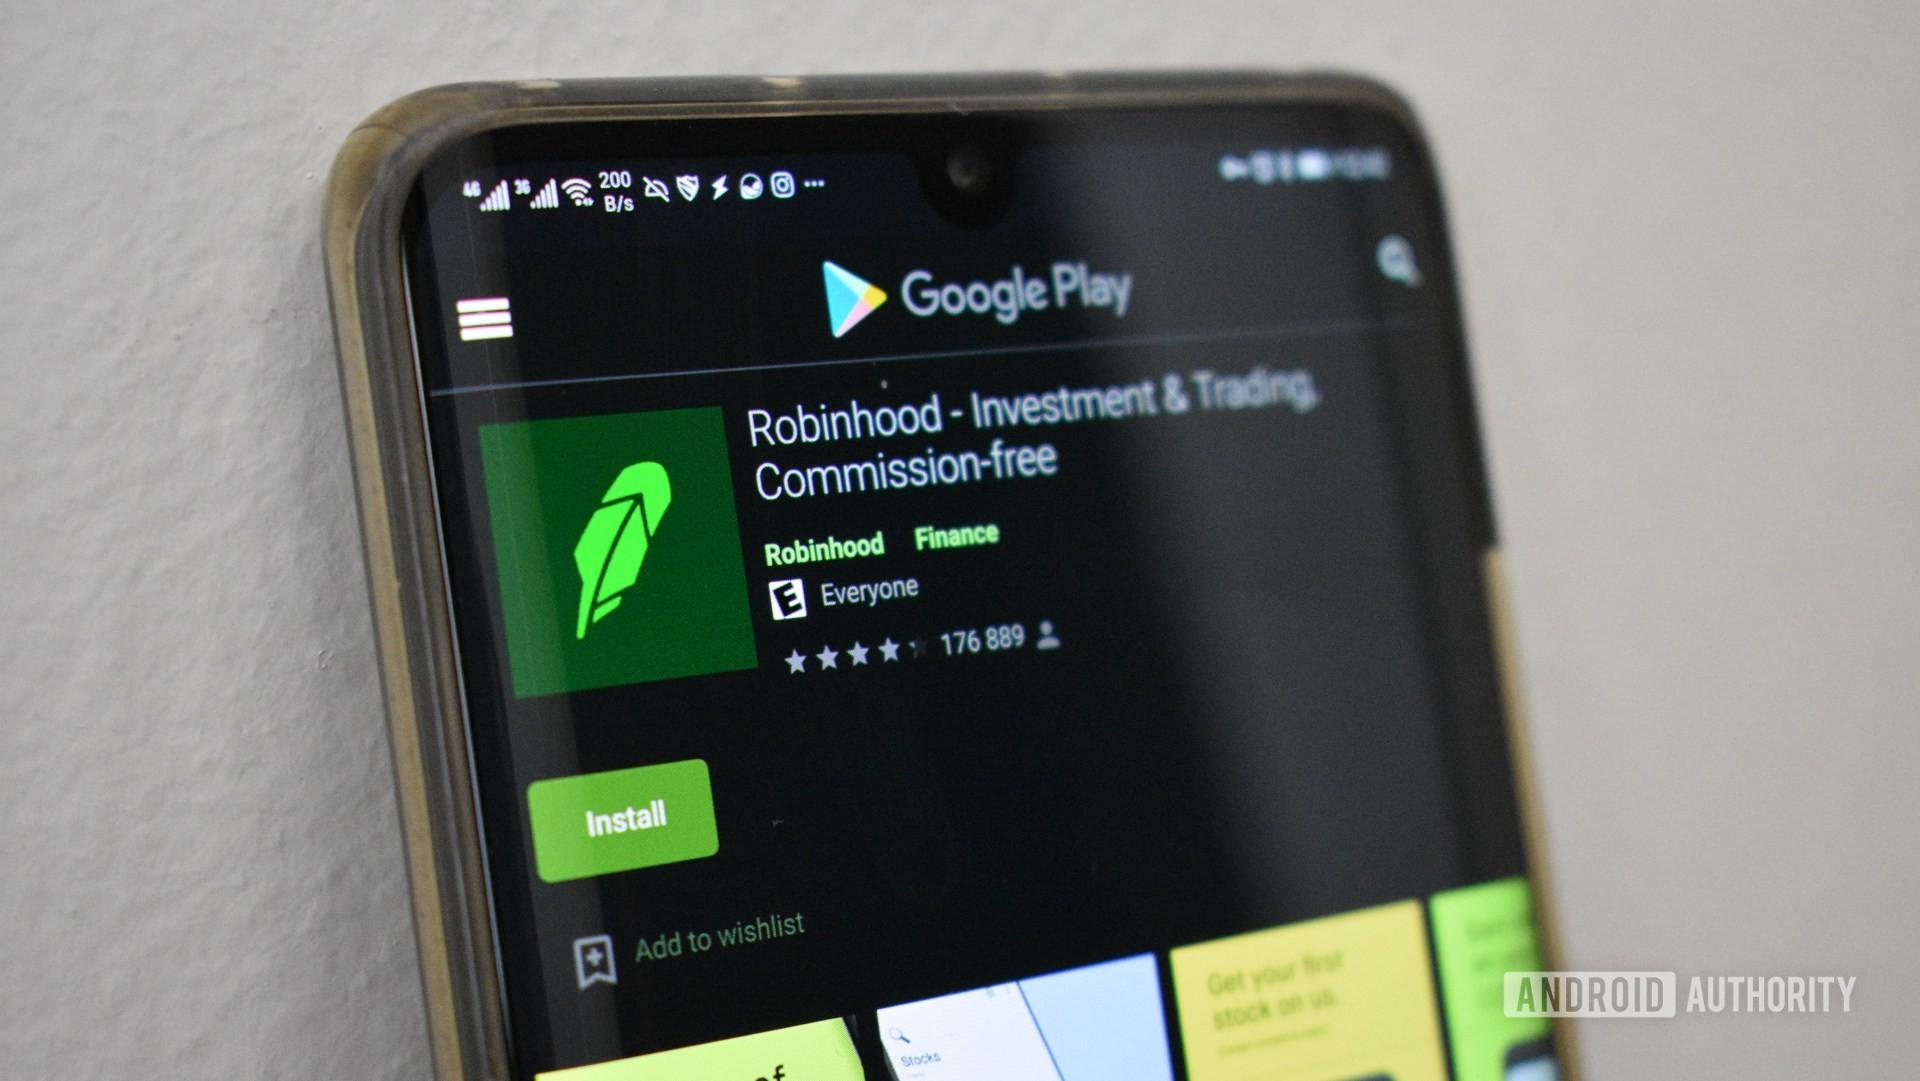 Robinhood on a phone screen